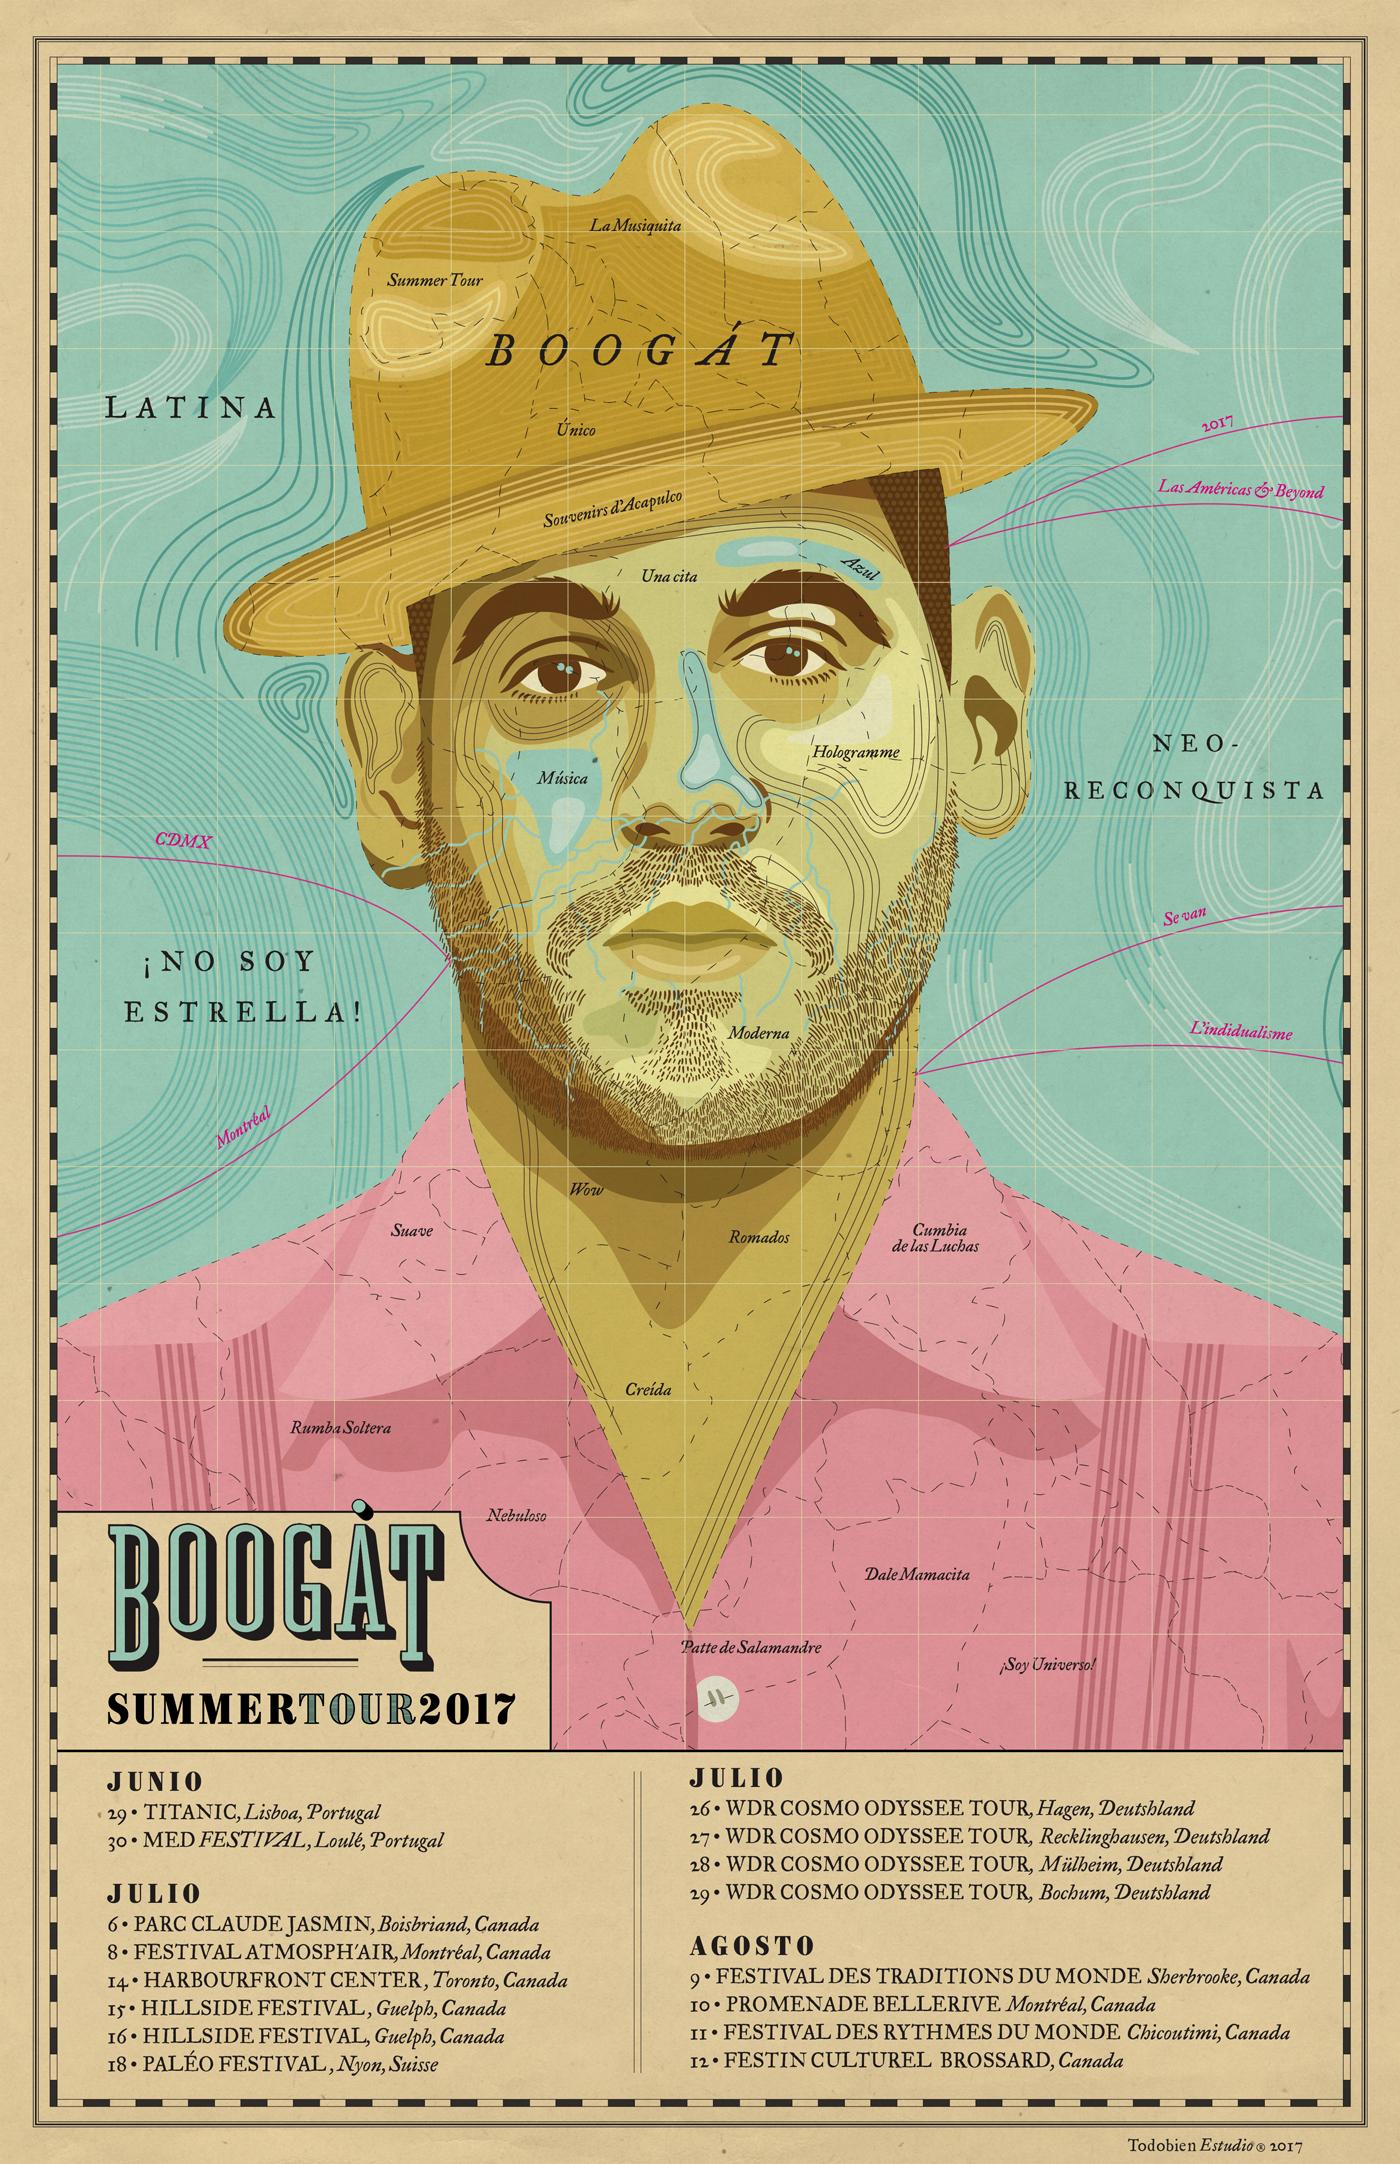 4cda77963fd Imagen Poster SUMMER TOUR 2017 de Boogát Diseñado en casa  TodoBien Estudio  por Oscar Reyes   Nayeli Rojas